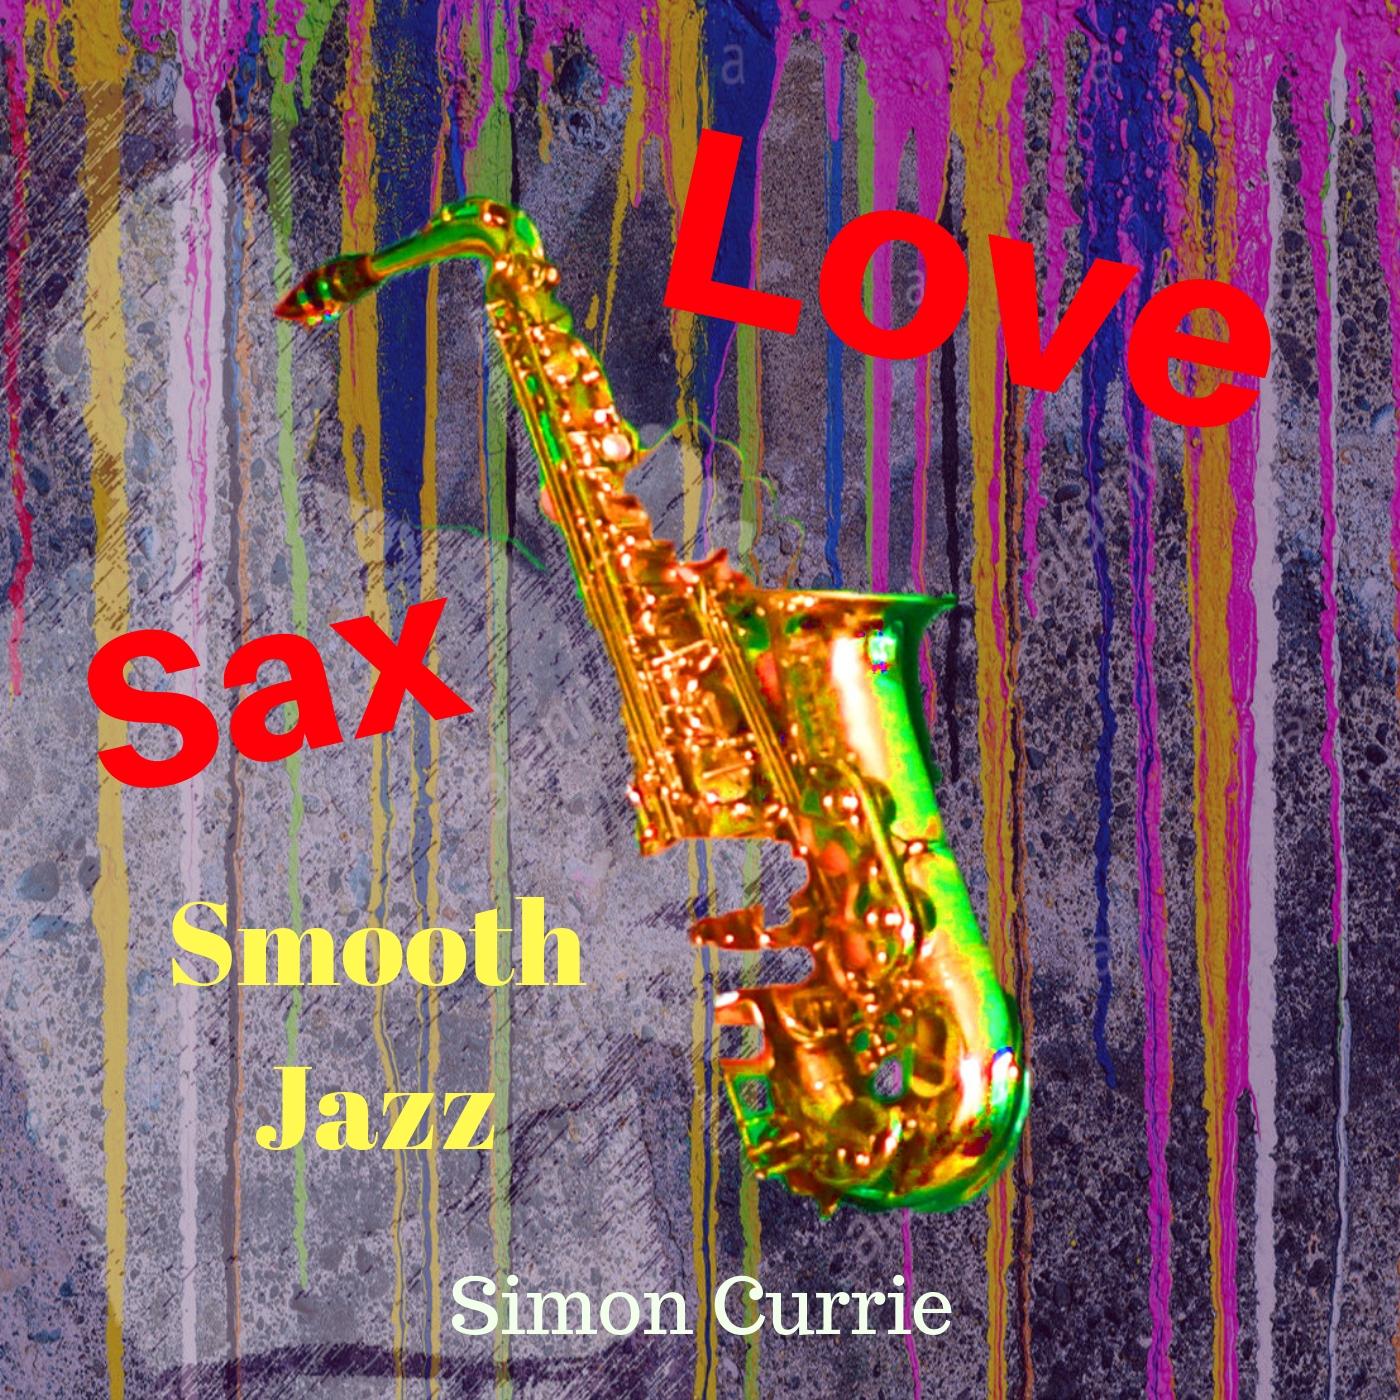 Simon Currie - Love Sax (SIGNED)